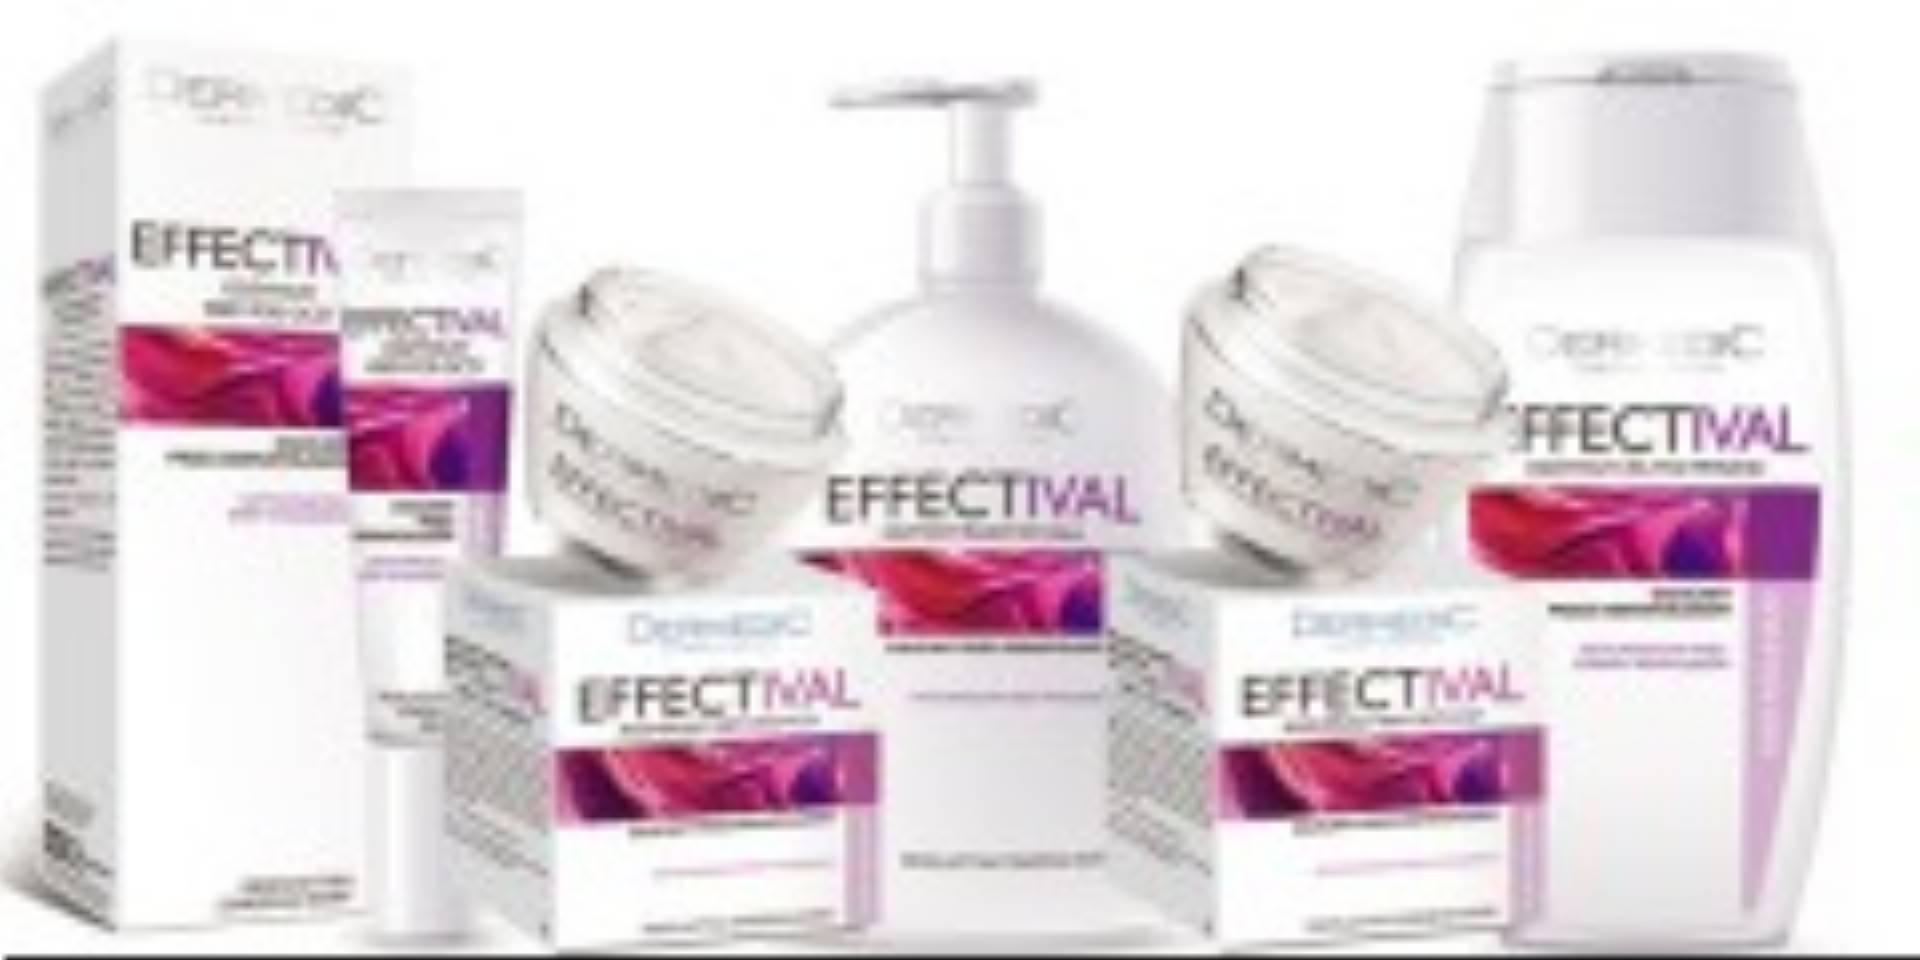 effectival-zestaw-kosmetykow